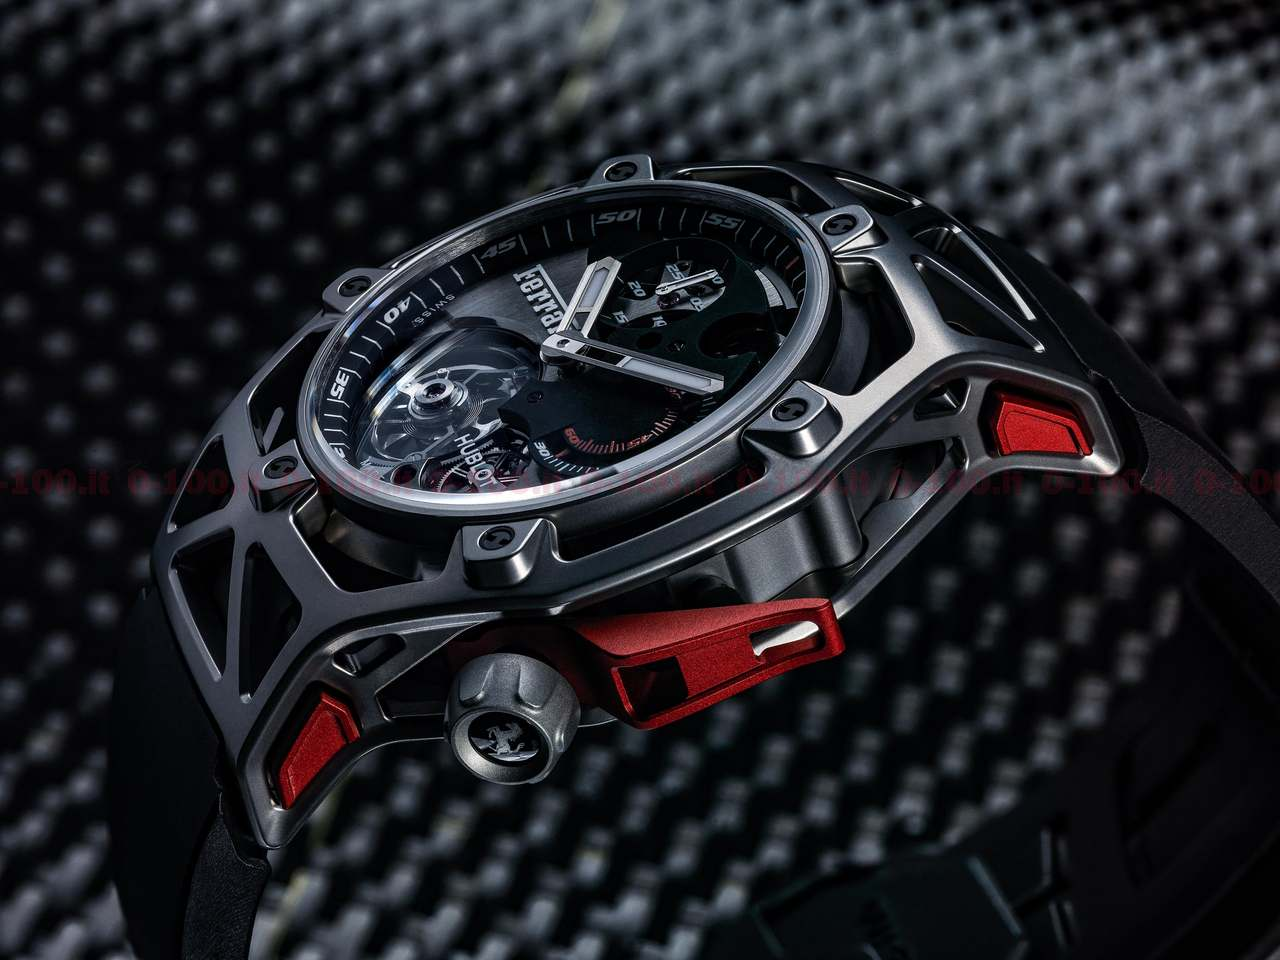 Hublot Techframe Ferrari 70 Years Tourbillon Chronograph Limited Edition_prezzo_price_0-10013